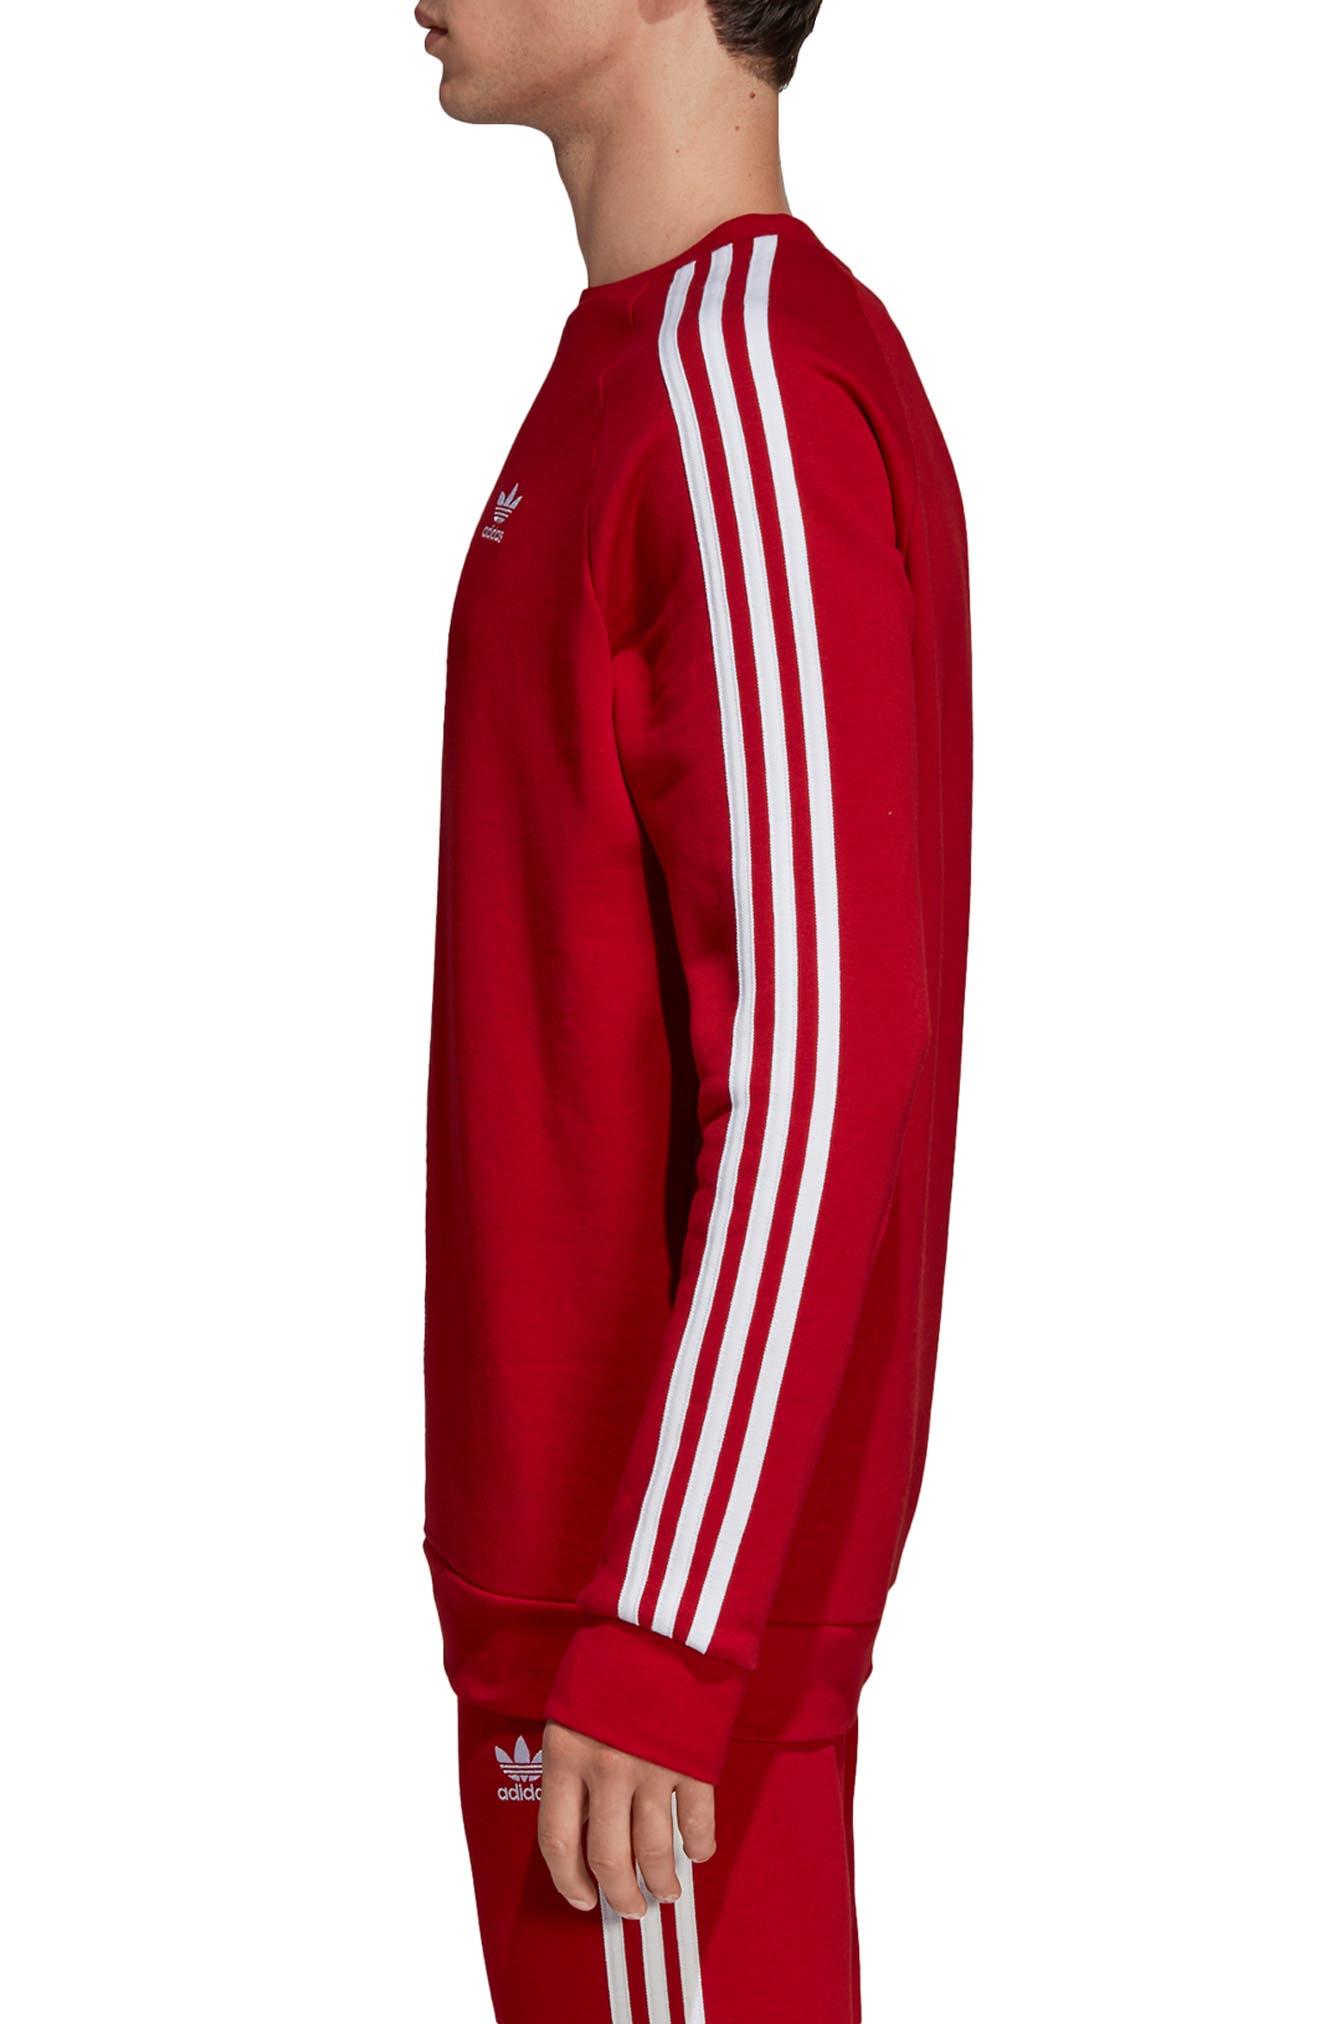 ADIDAS ORIGINALS, 3-Stripes Raglan Sweatshirt, Alternate thumbnail 3, color, POWER RED